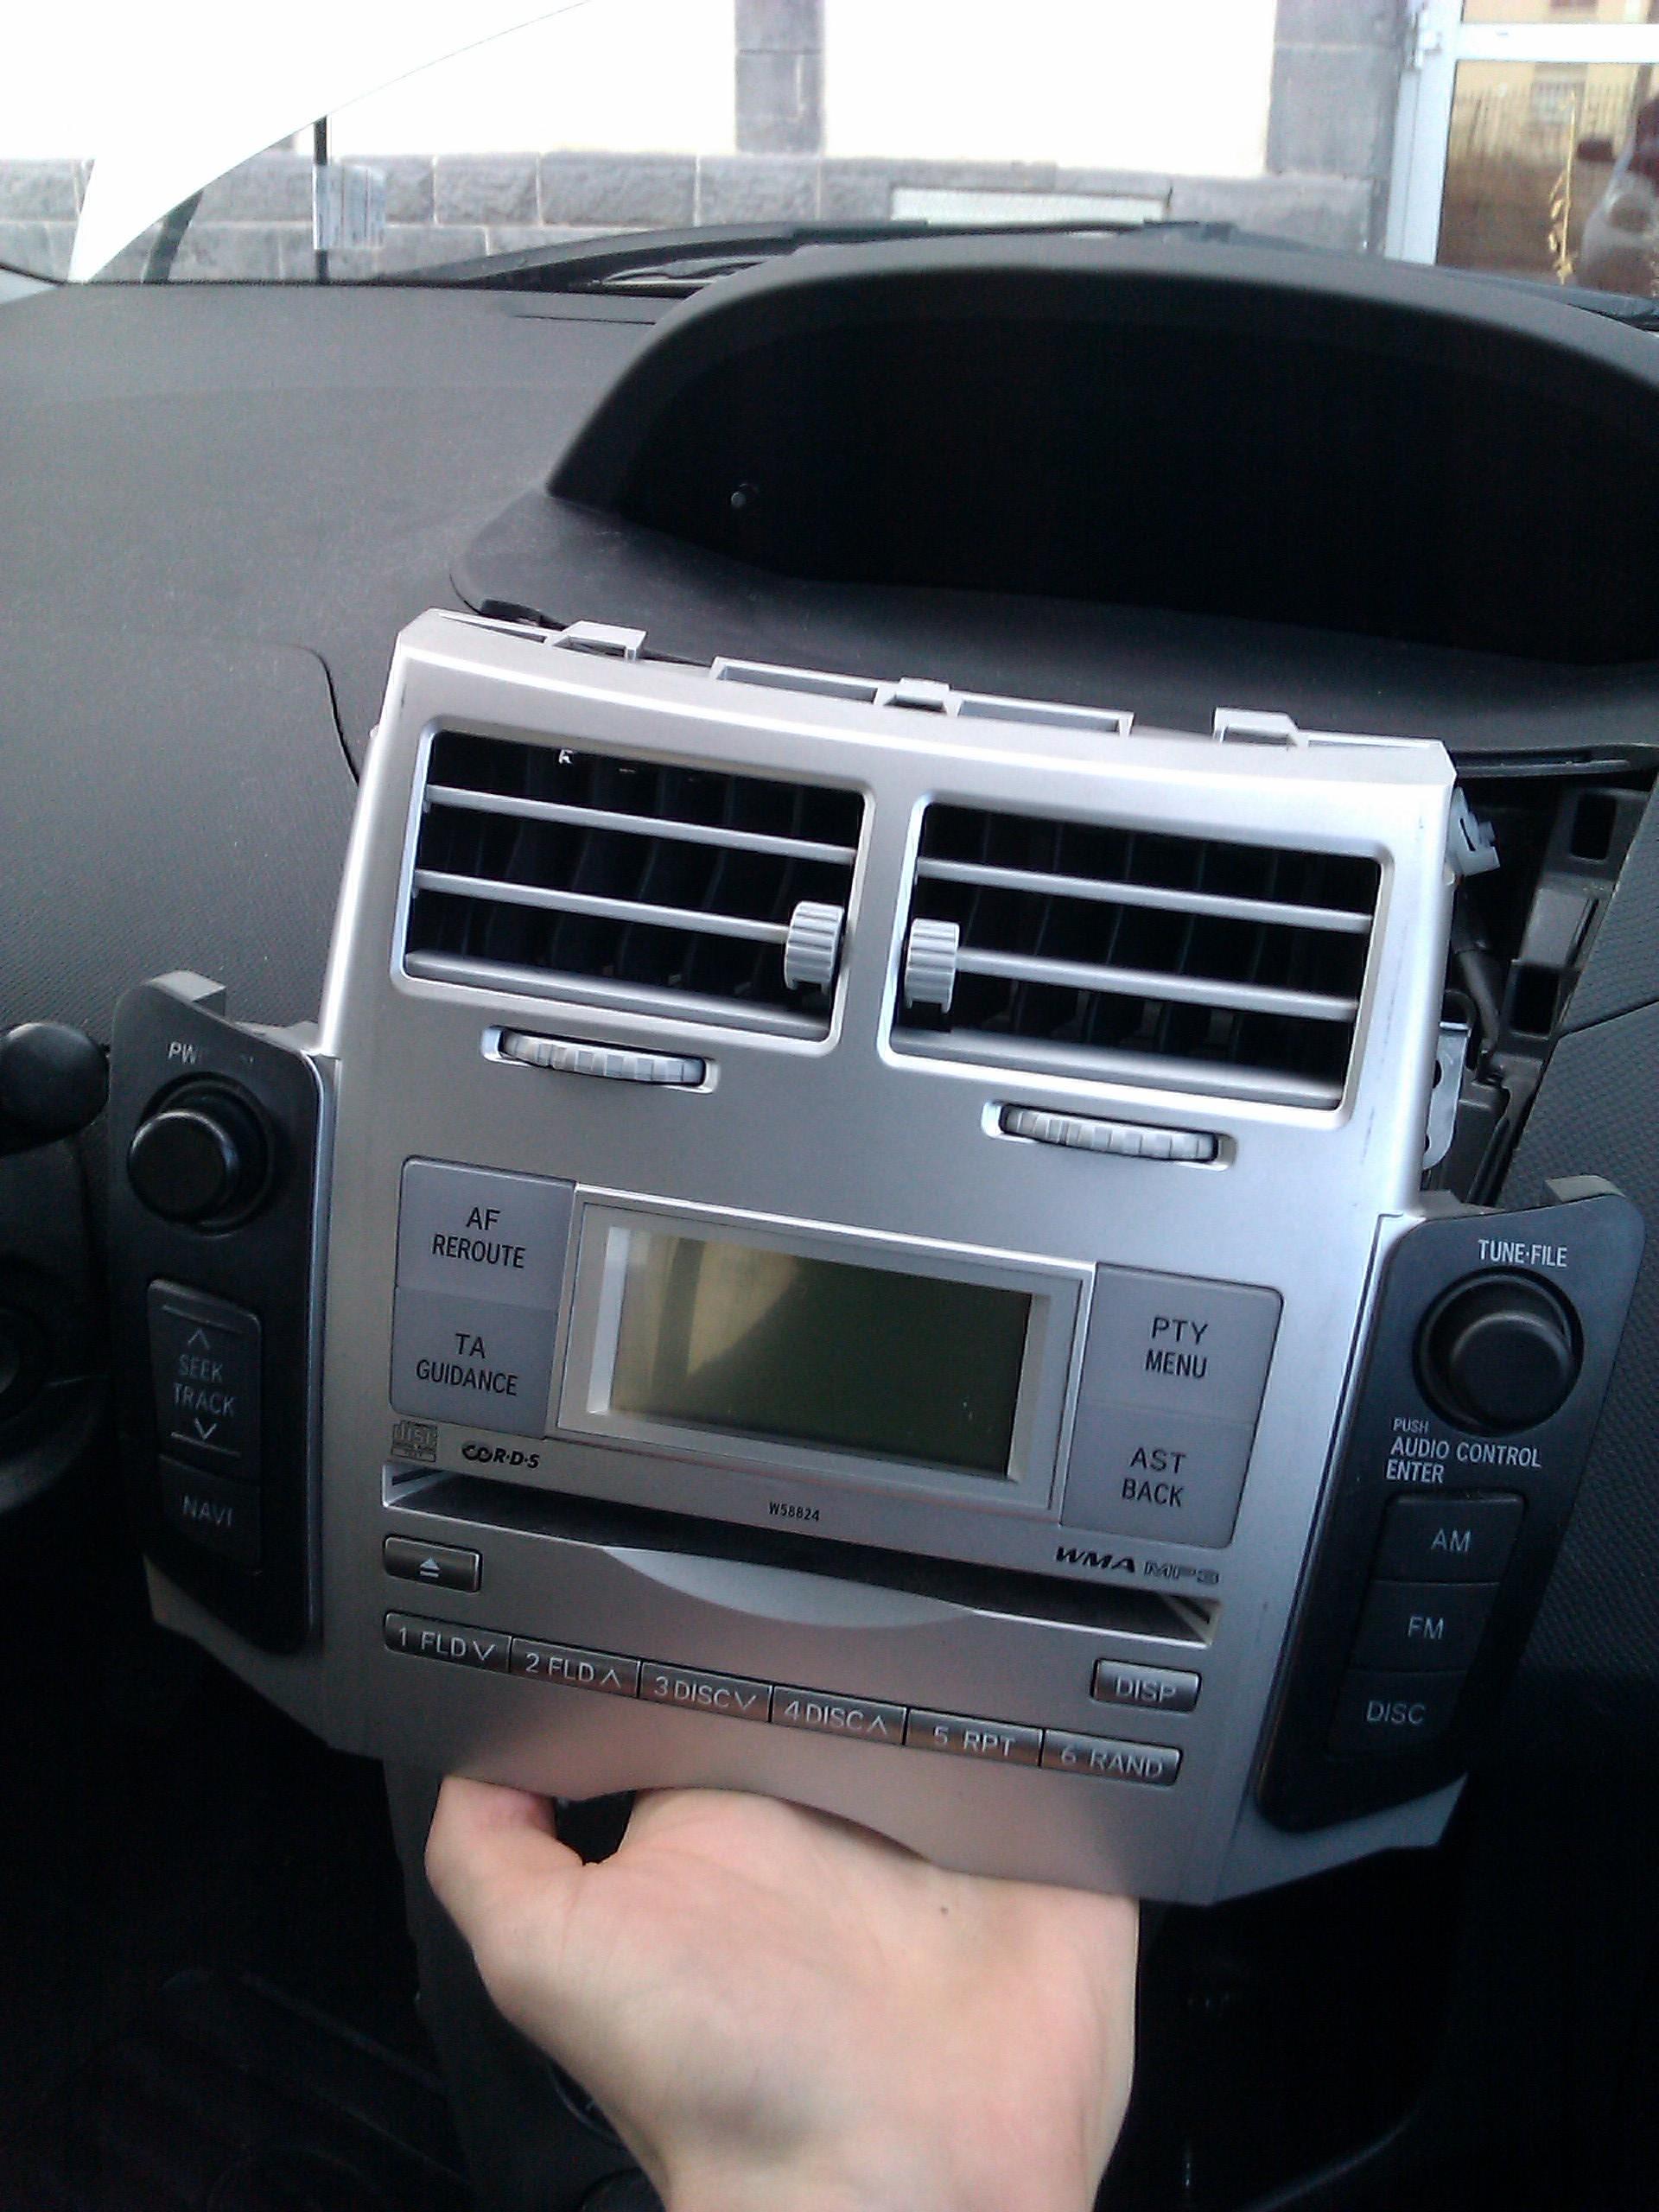 Auto Manual Blog January 2018 Nissan Primastar Wiring Diagram Free Download 100 Repair Toyota Yaris 2010 Vitz